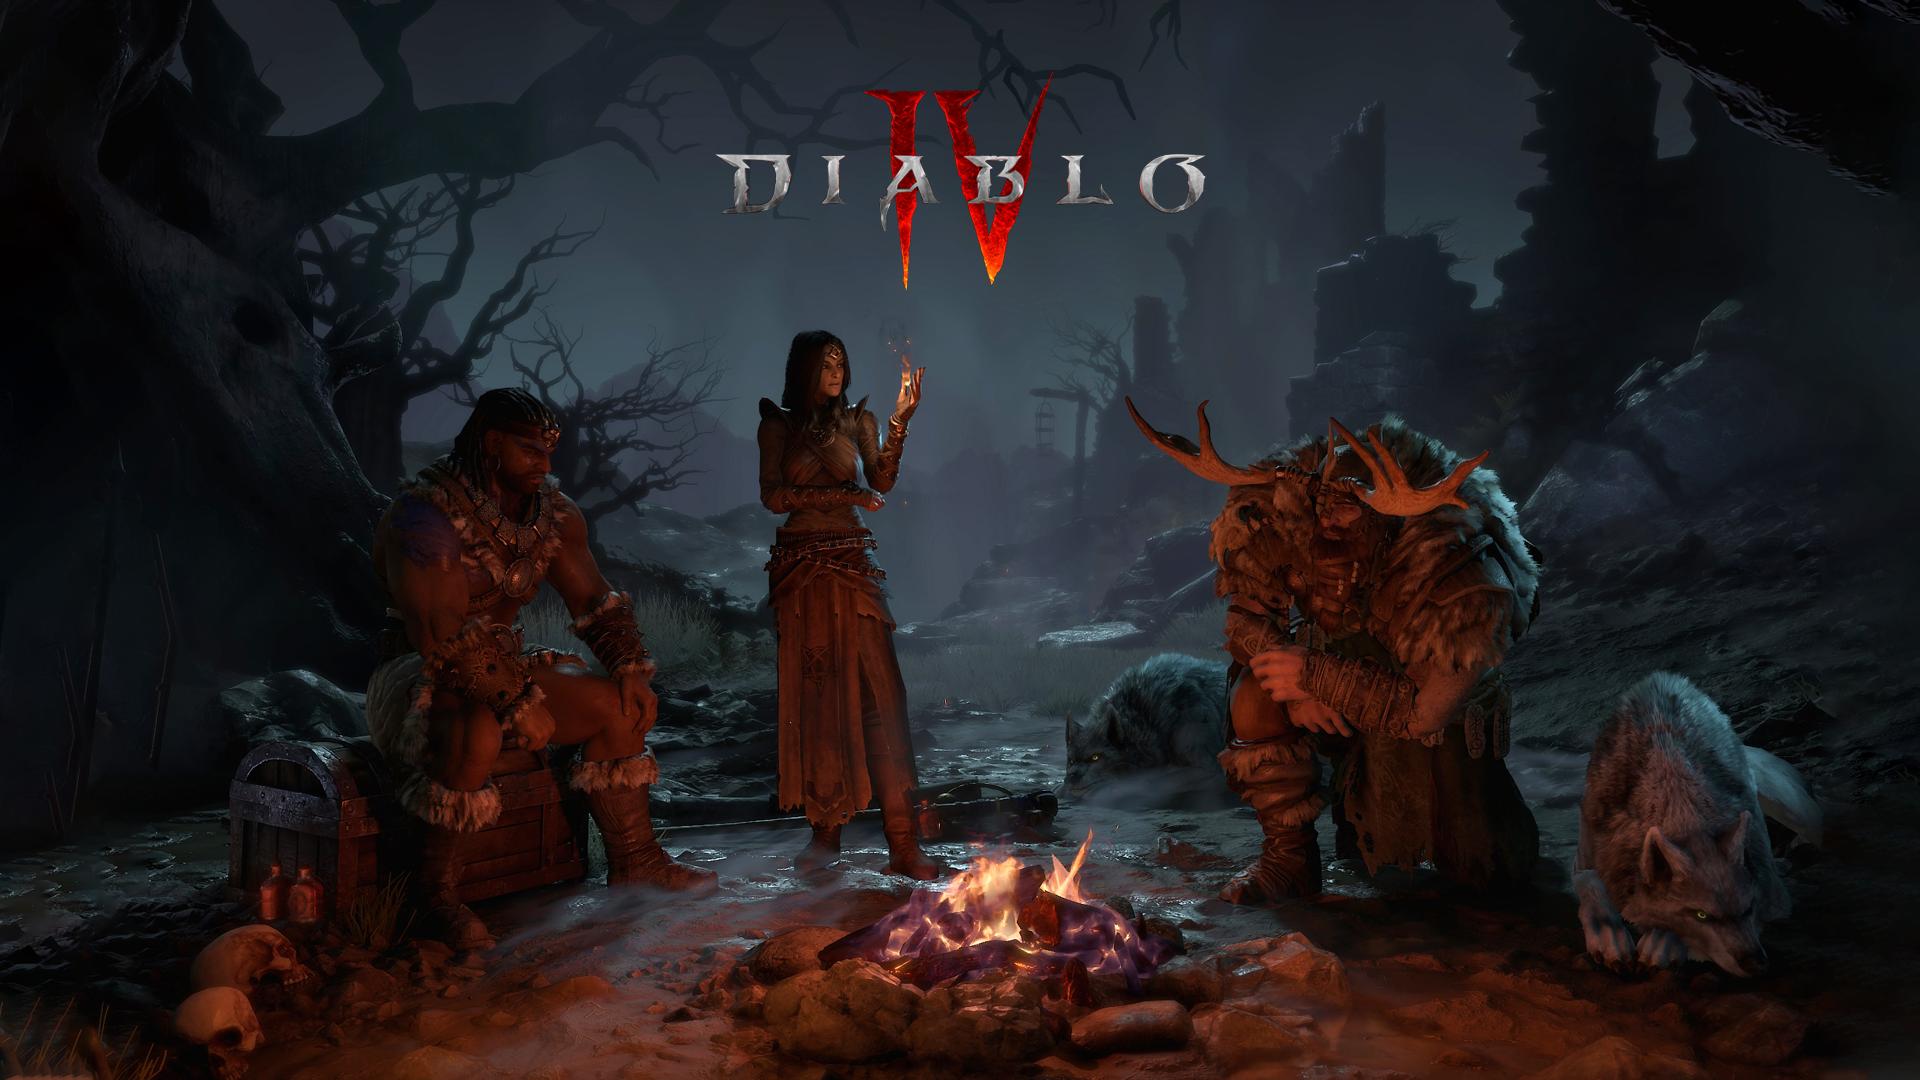 Diablo IV - PS4 / PS5 Wallpapers - 1920x1080